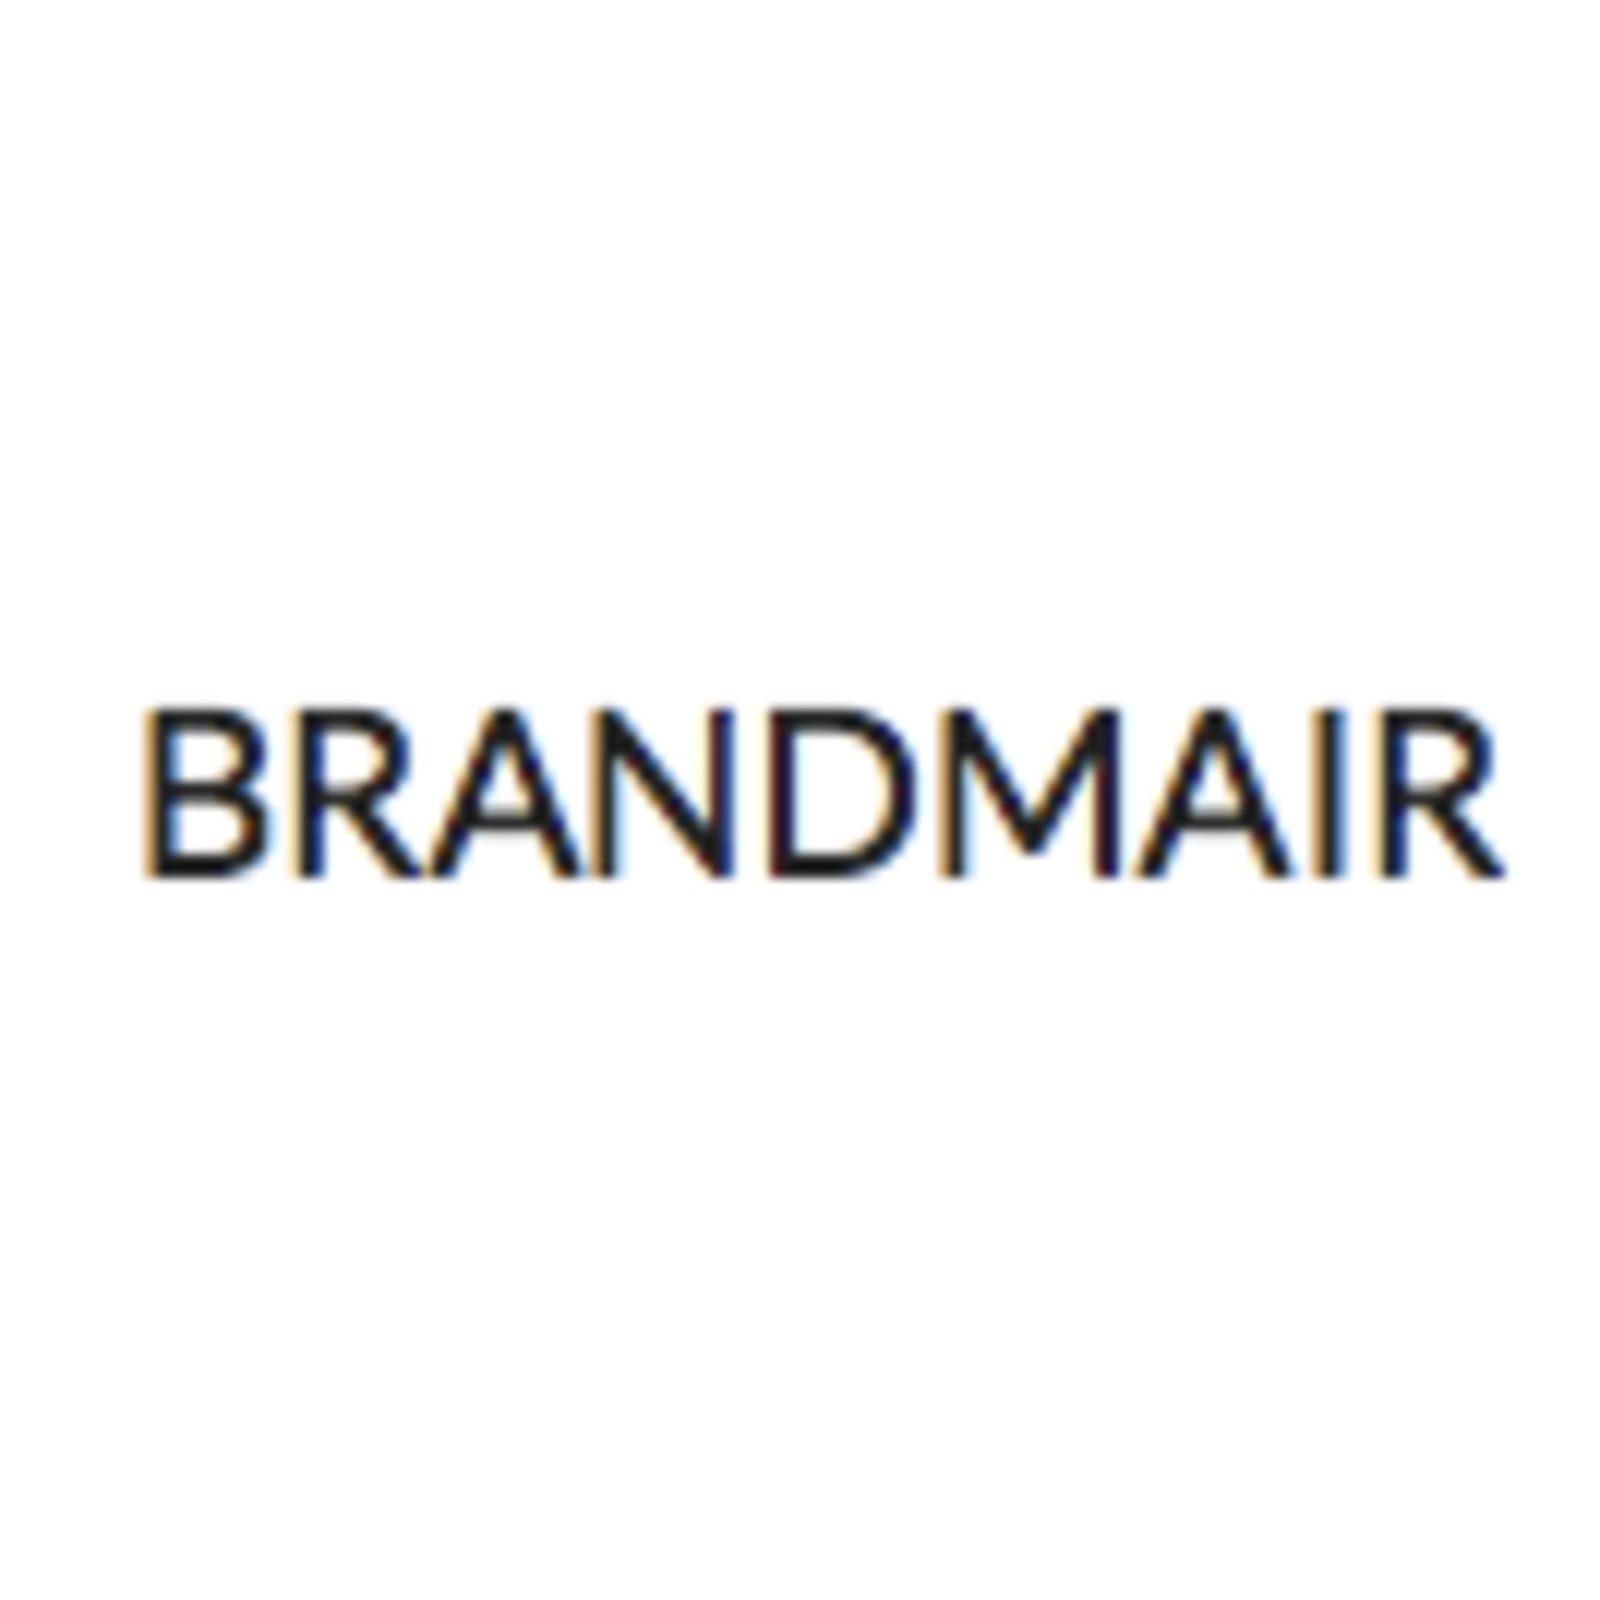 BRANDMAIR